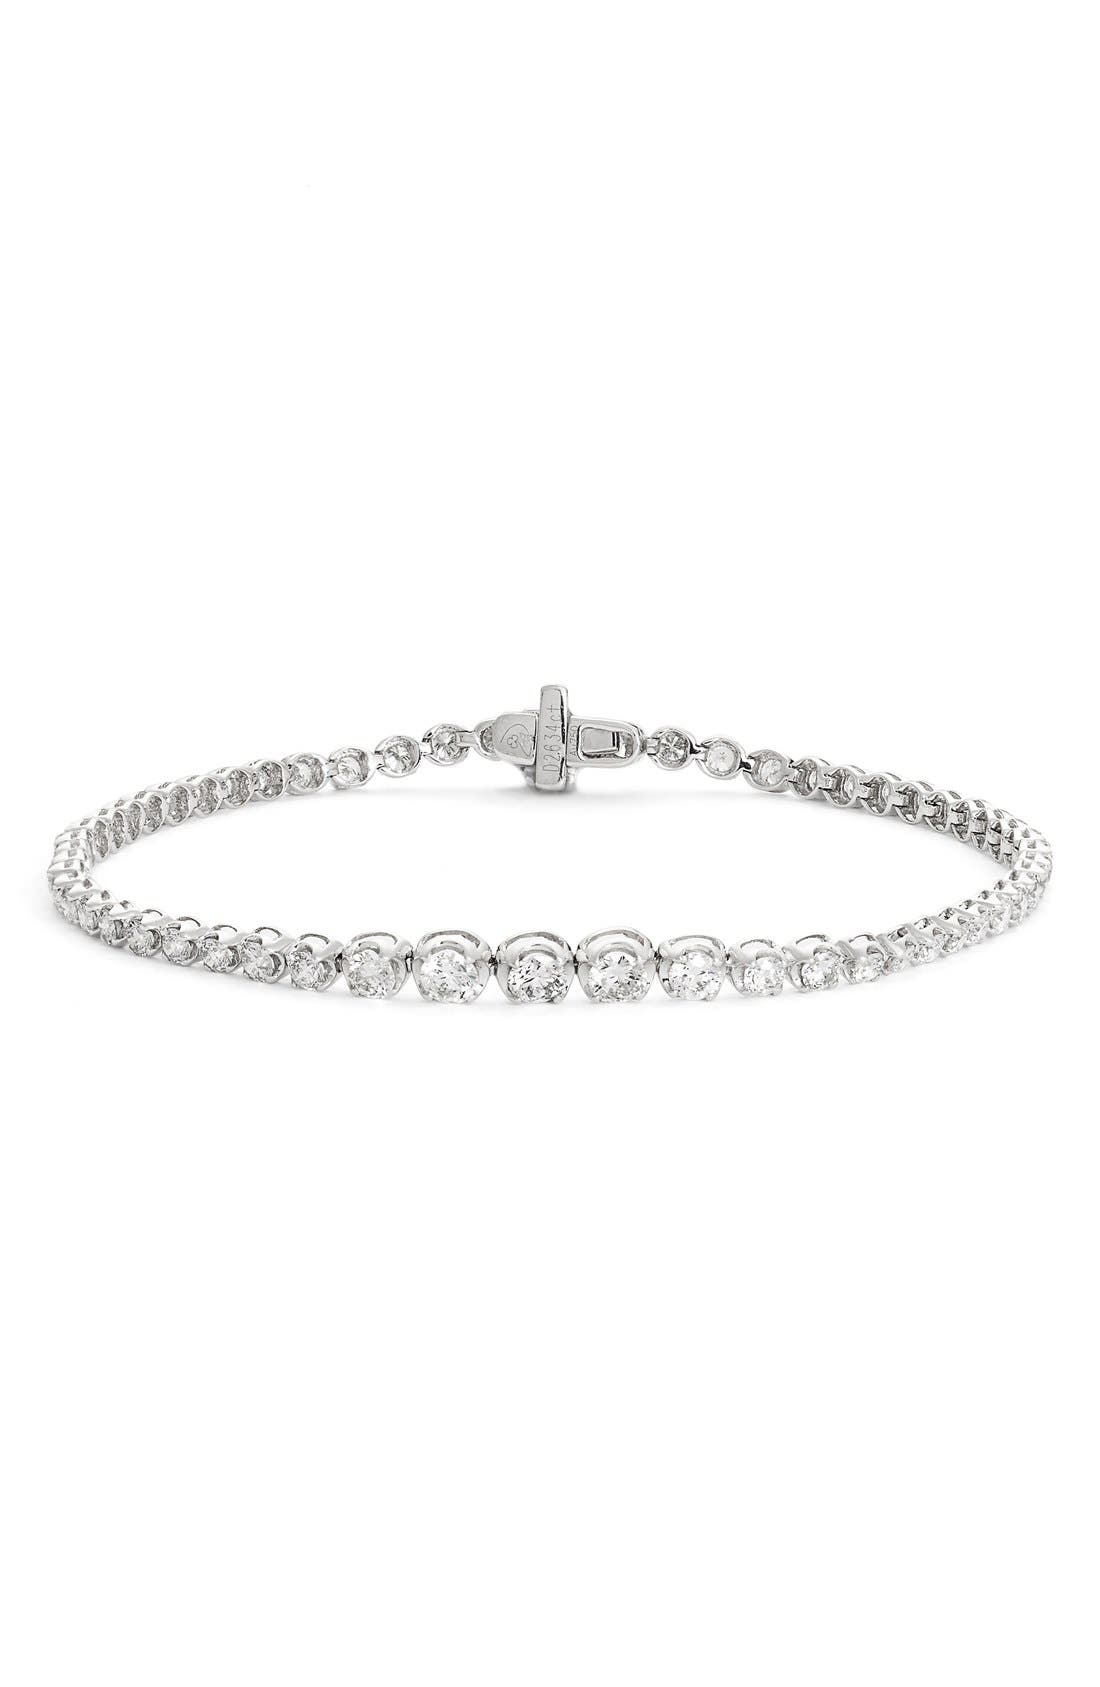 Alternate Image 1 Selected - Bony Levy Liora Diamond Tennis Bracelet (Nordstrom Exclusive)